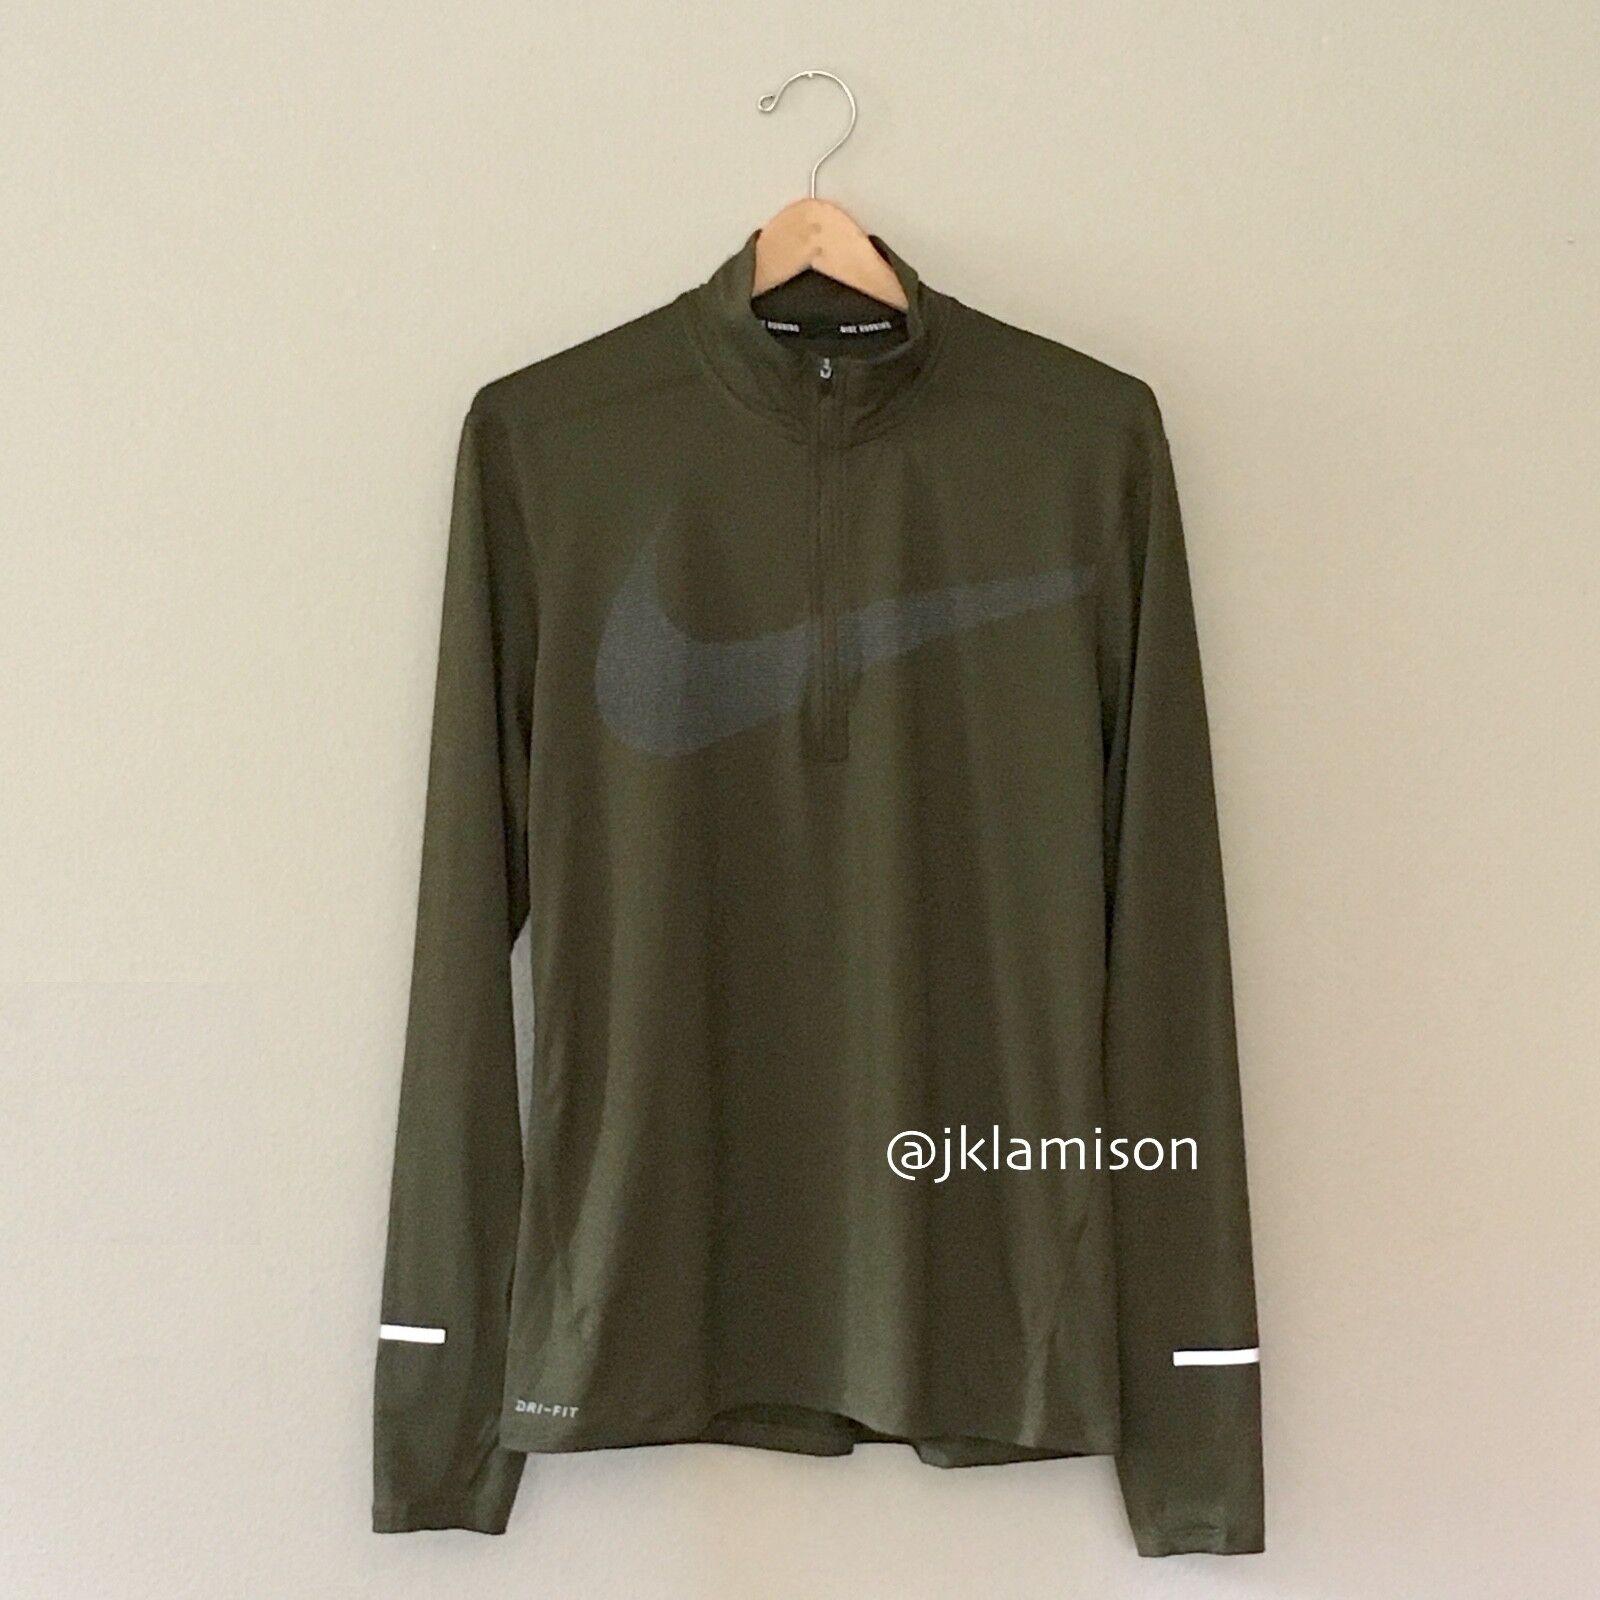 Nike Men's Therma Sphere Element Hybrid Half Zip Running Shirt Sz S M AO2617 471